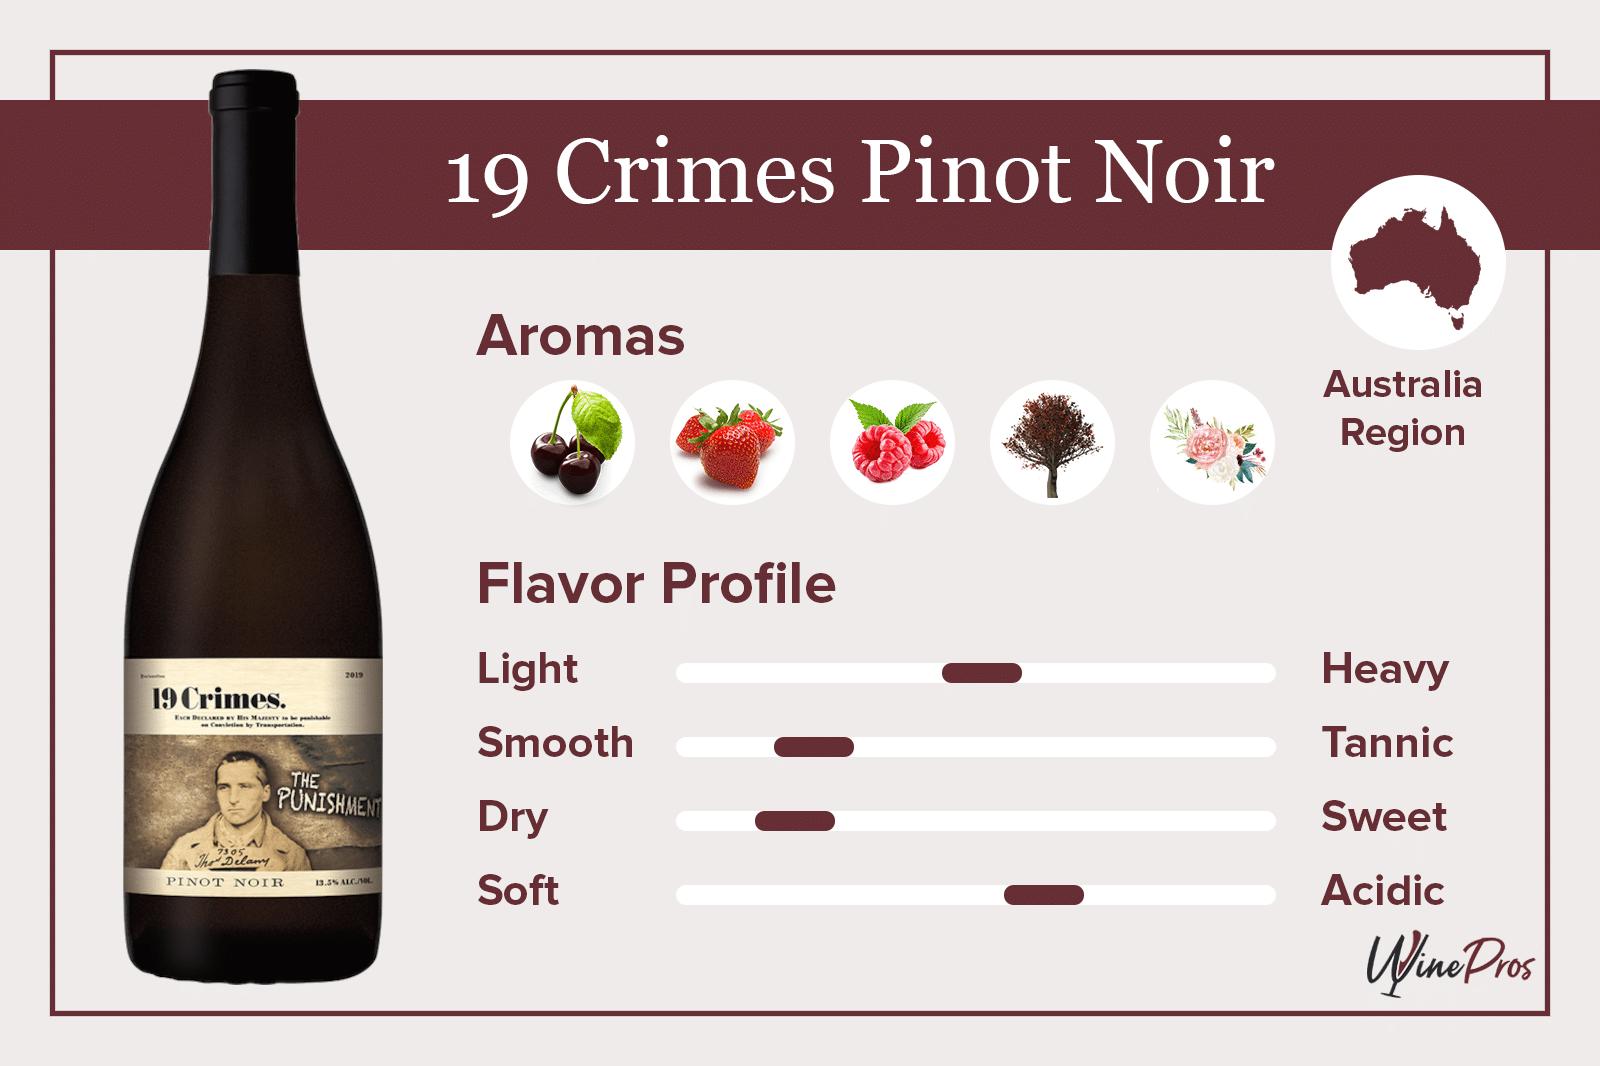 19 Crimes Pinot Noir Review (2021) – The Punishment